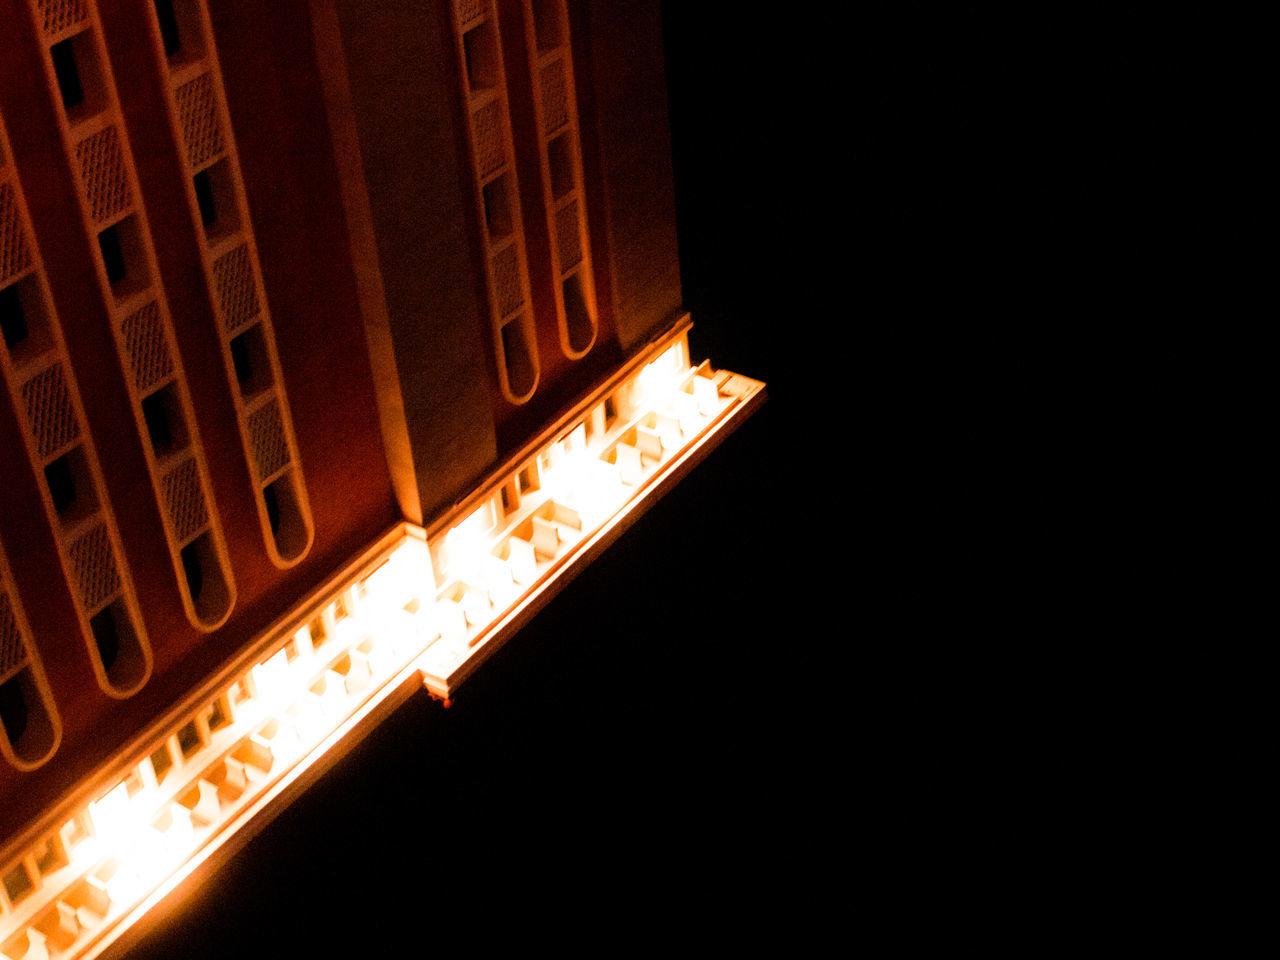 Upside downtown Architecture Built Structure Night Invert EyeEmNewHere Olympus Olympus E-P3 Plaza De Roma in Intramuros, Manila Eyeem Philippines The Architect - 2017 EyeEm Awards